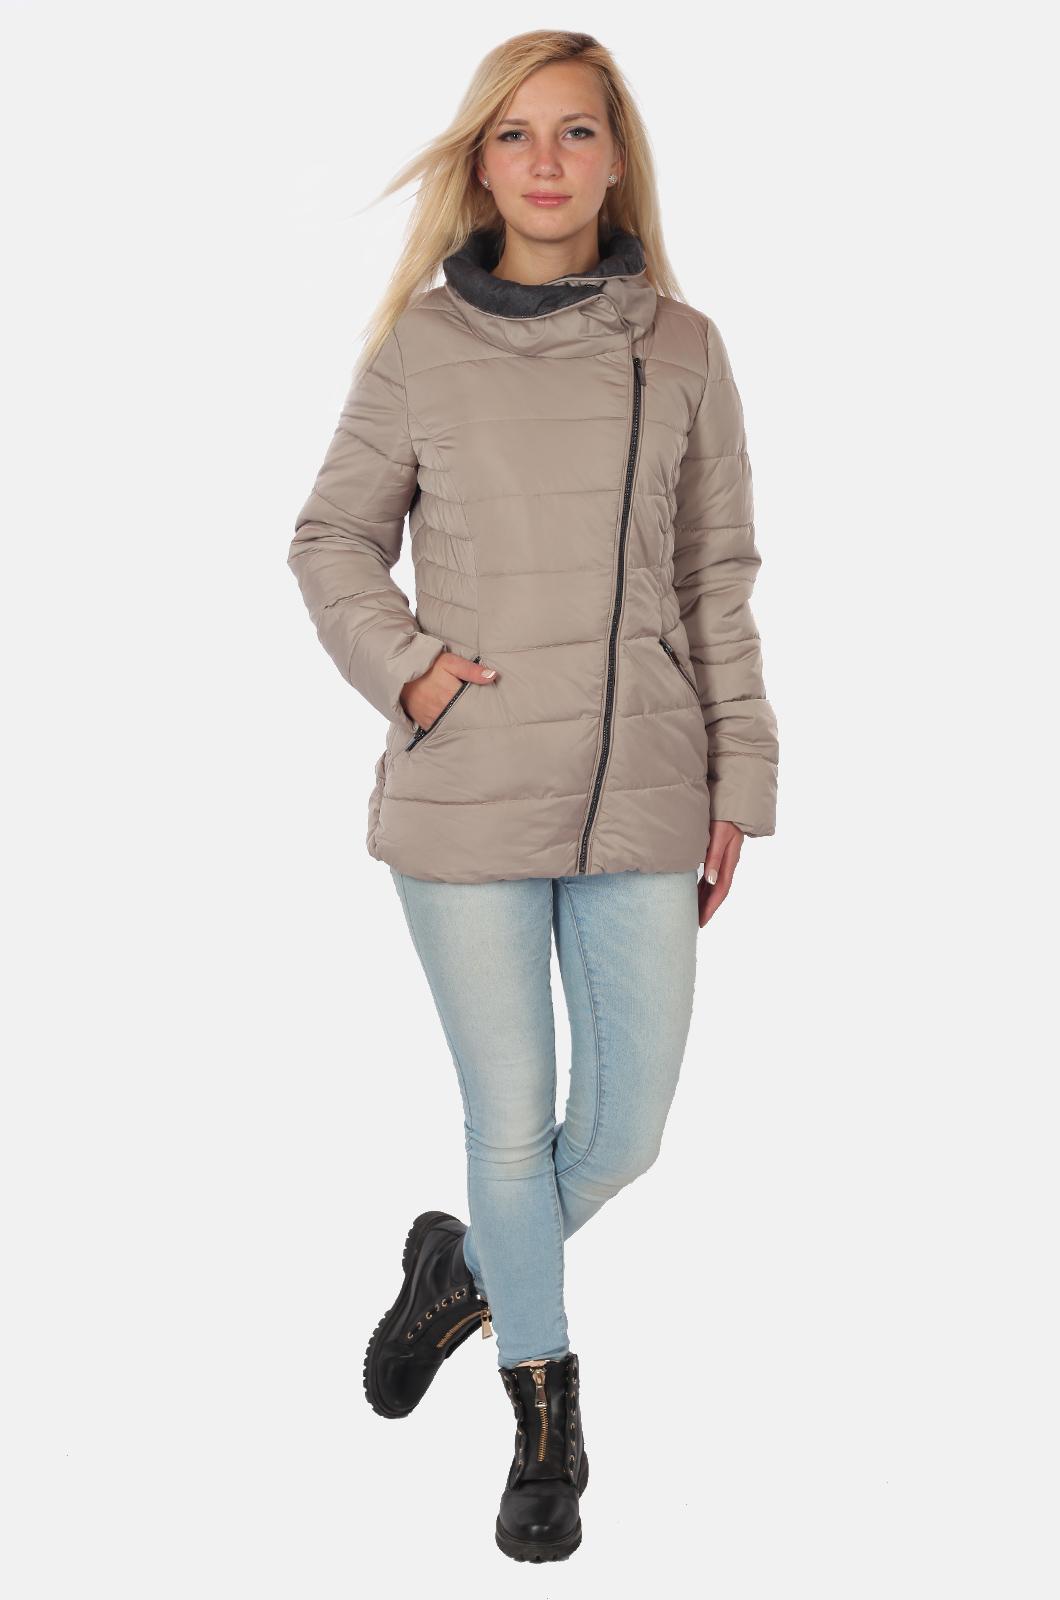 Теплая женская куртка косуха – новинка каталога